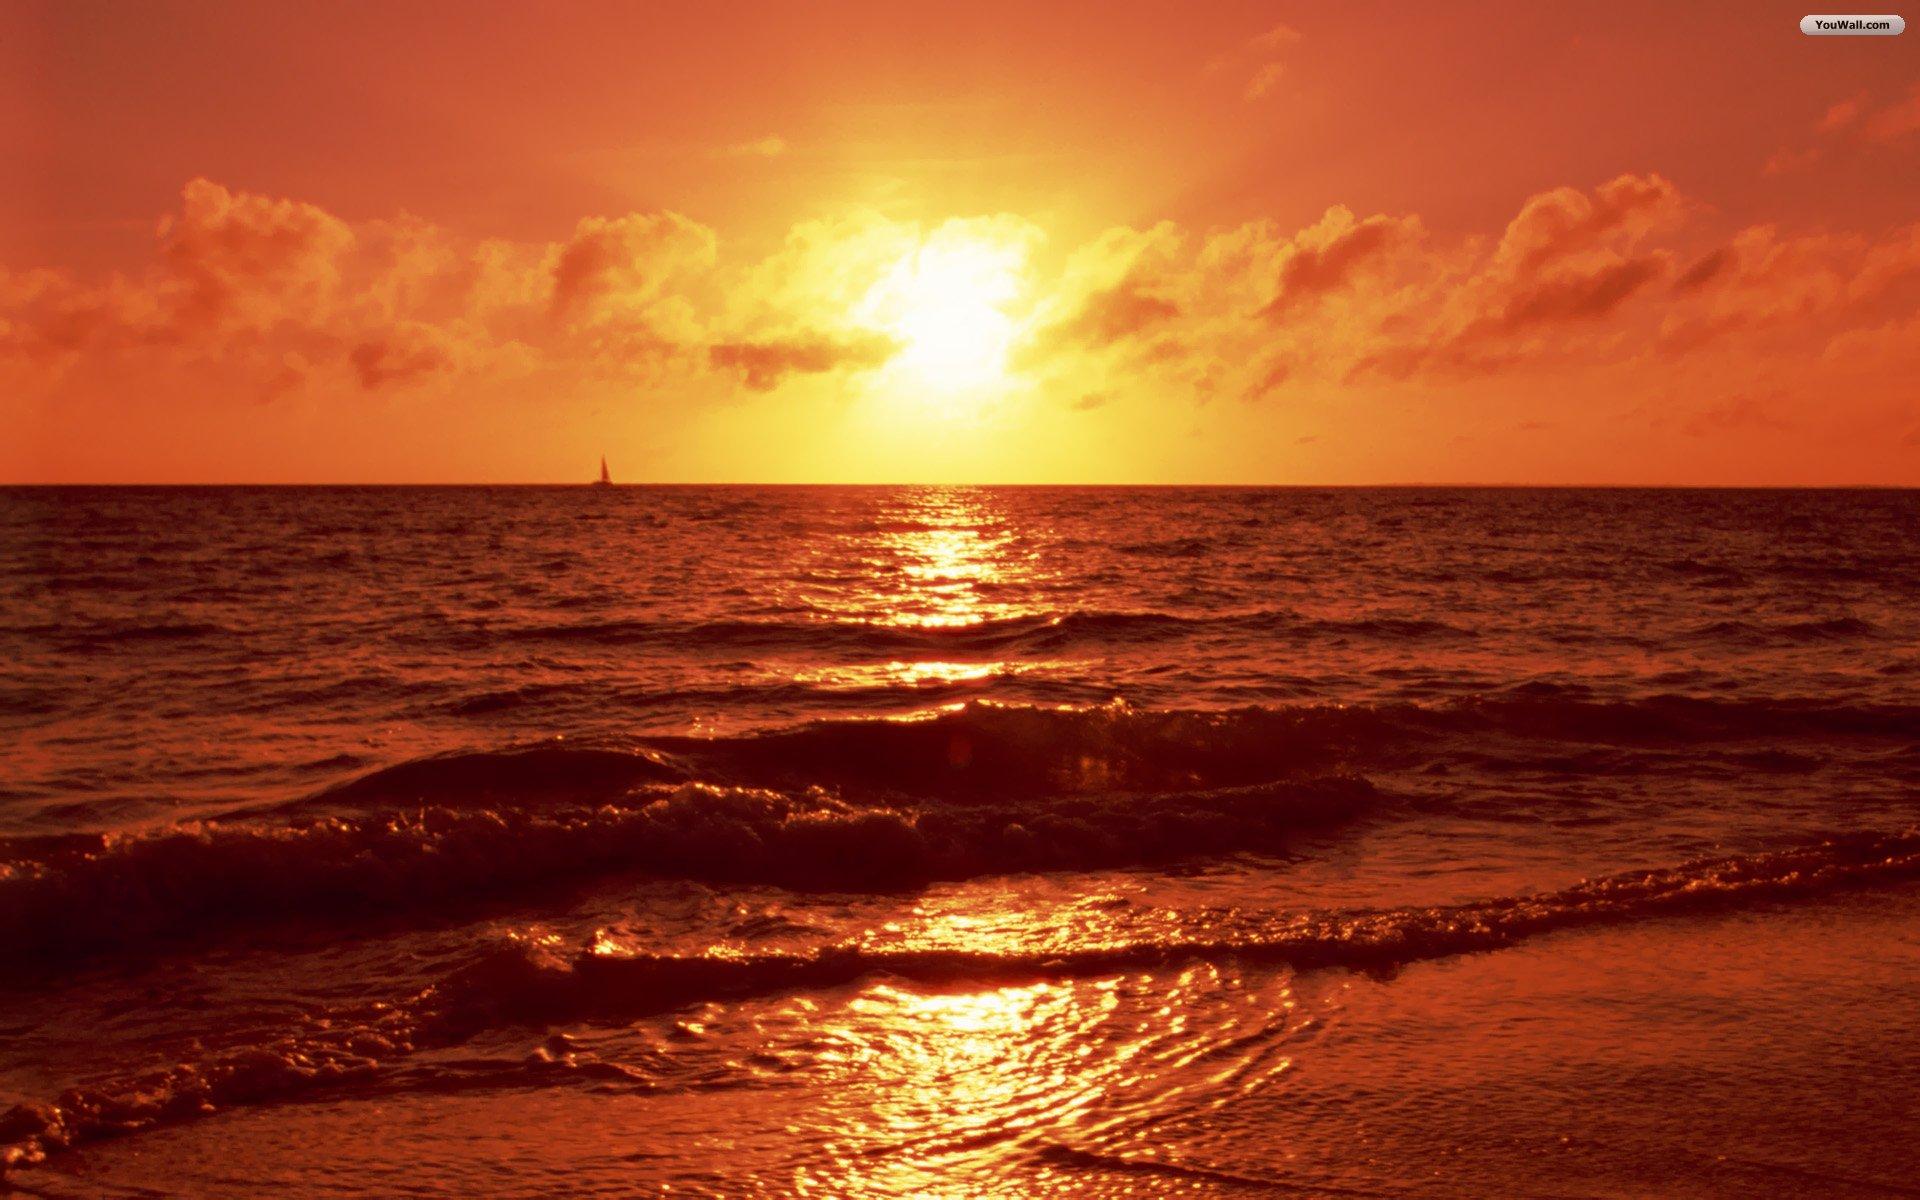 Beach Sunset Wallpaper Image Picture 2339 Wallpaper Cool 1920x1200